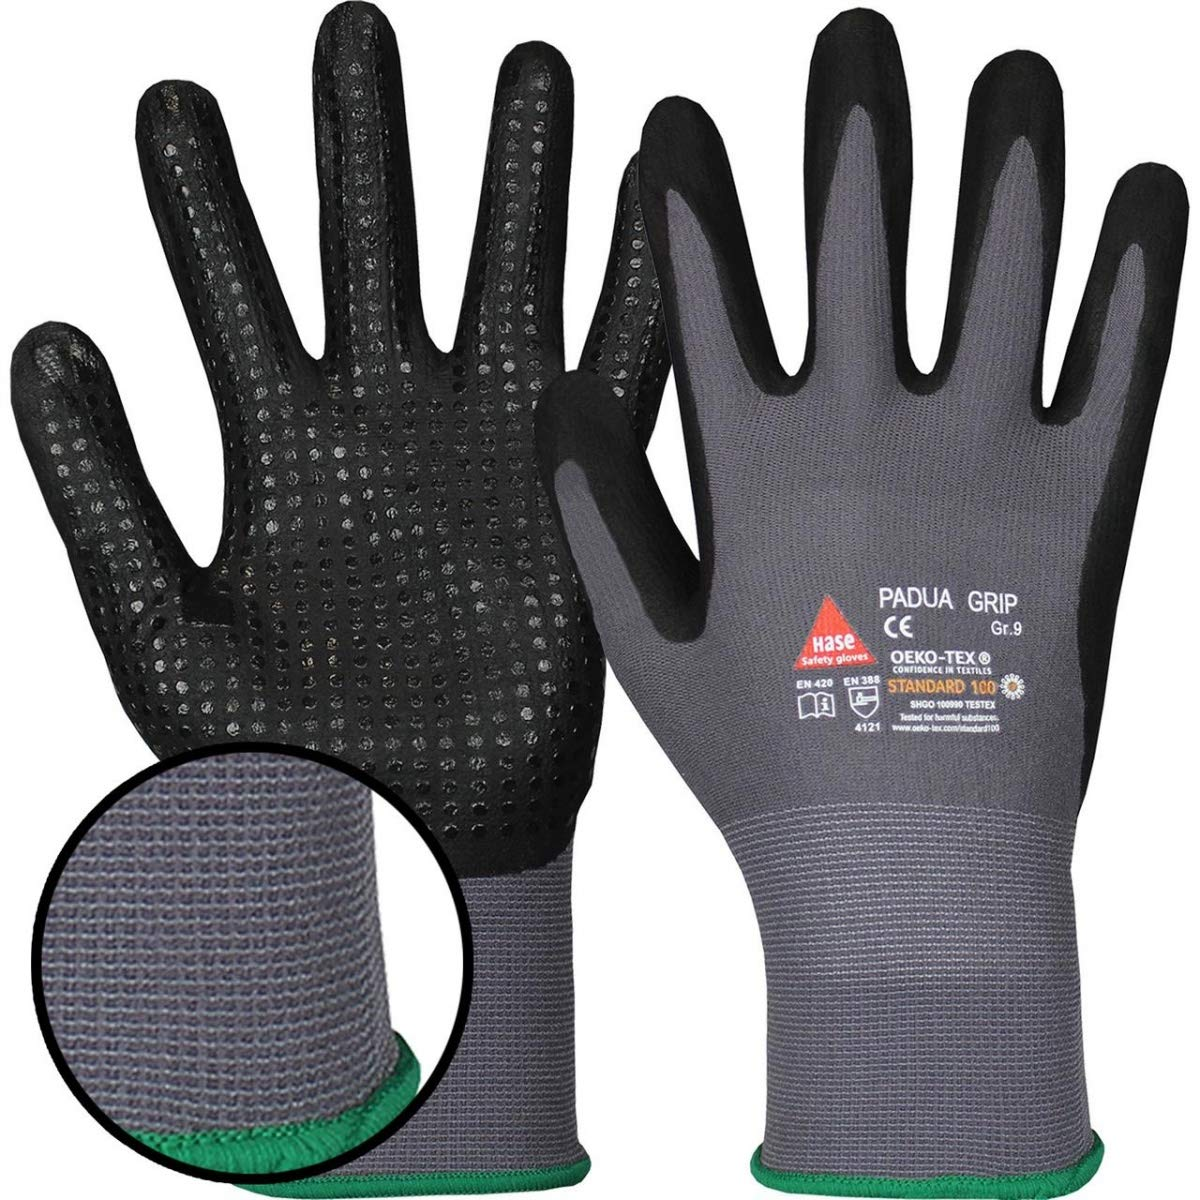 10 Paar Hase Safety Padua Grip Green Nitril-Arbeitshandschuhe 06 Rutschfeste Mechaniker-Handschuhe Gr/ö/ße XS